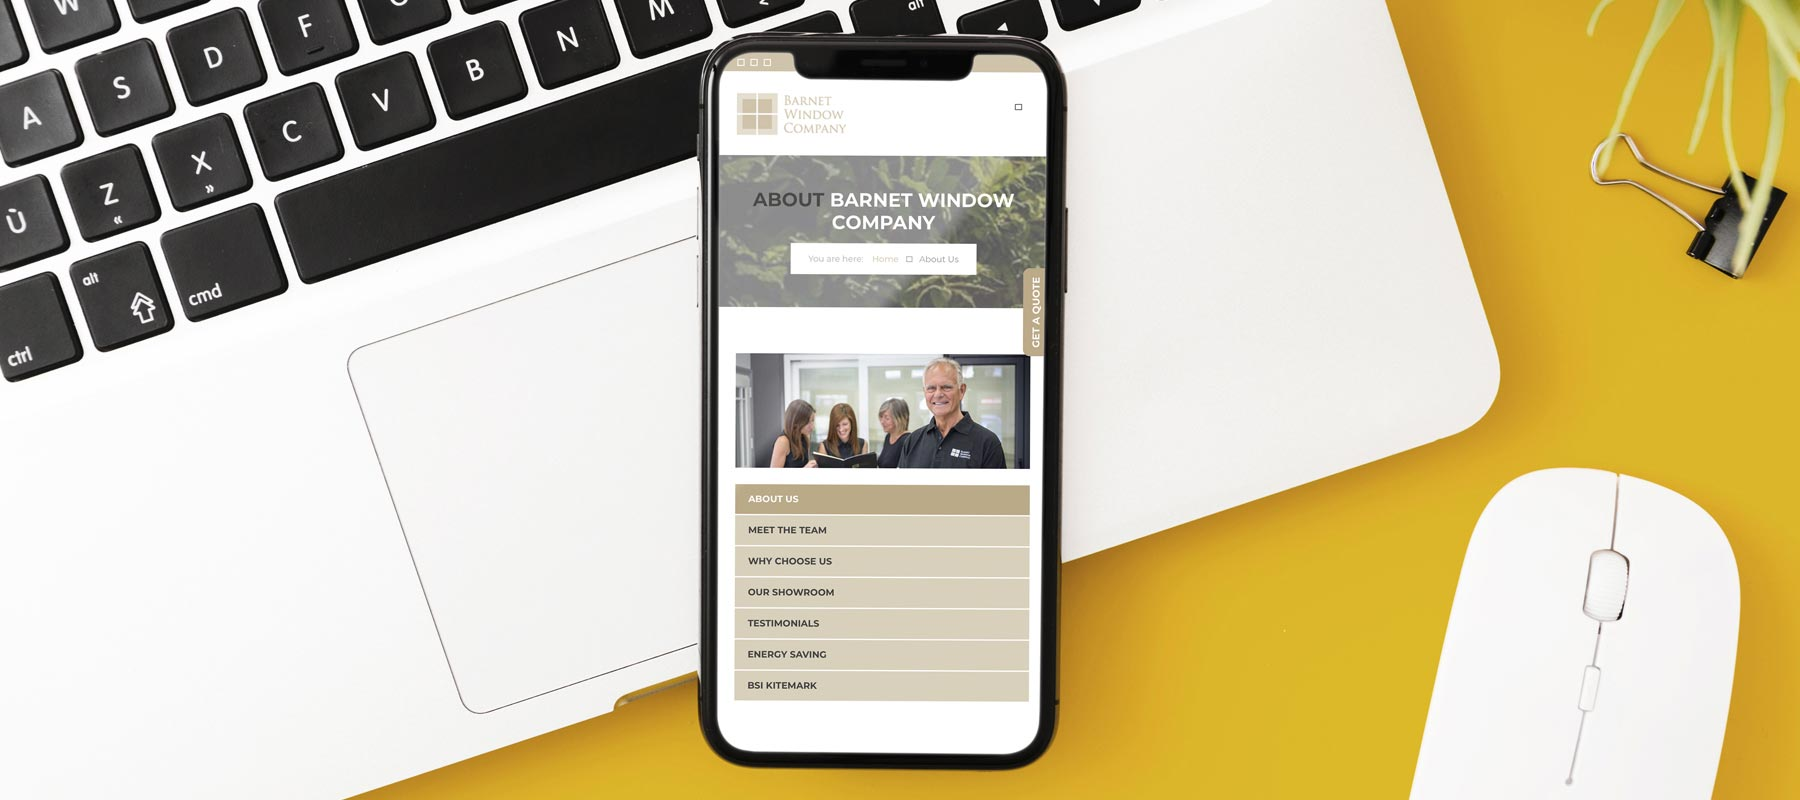 Barnet Window Company - Website Design and Build